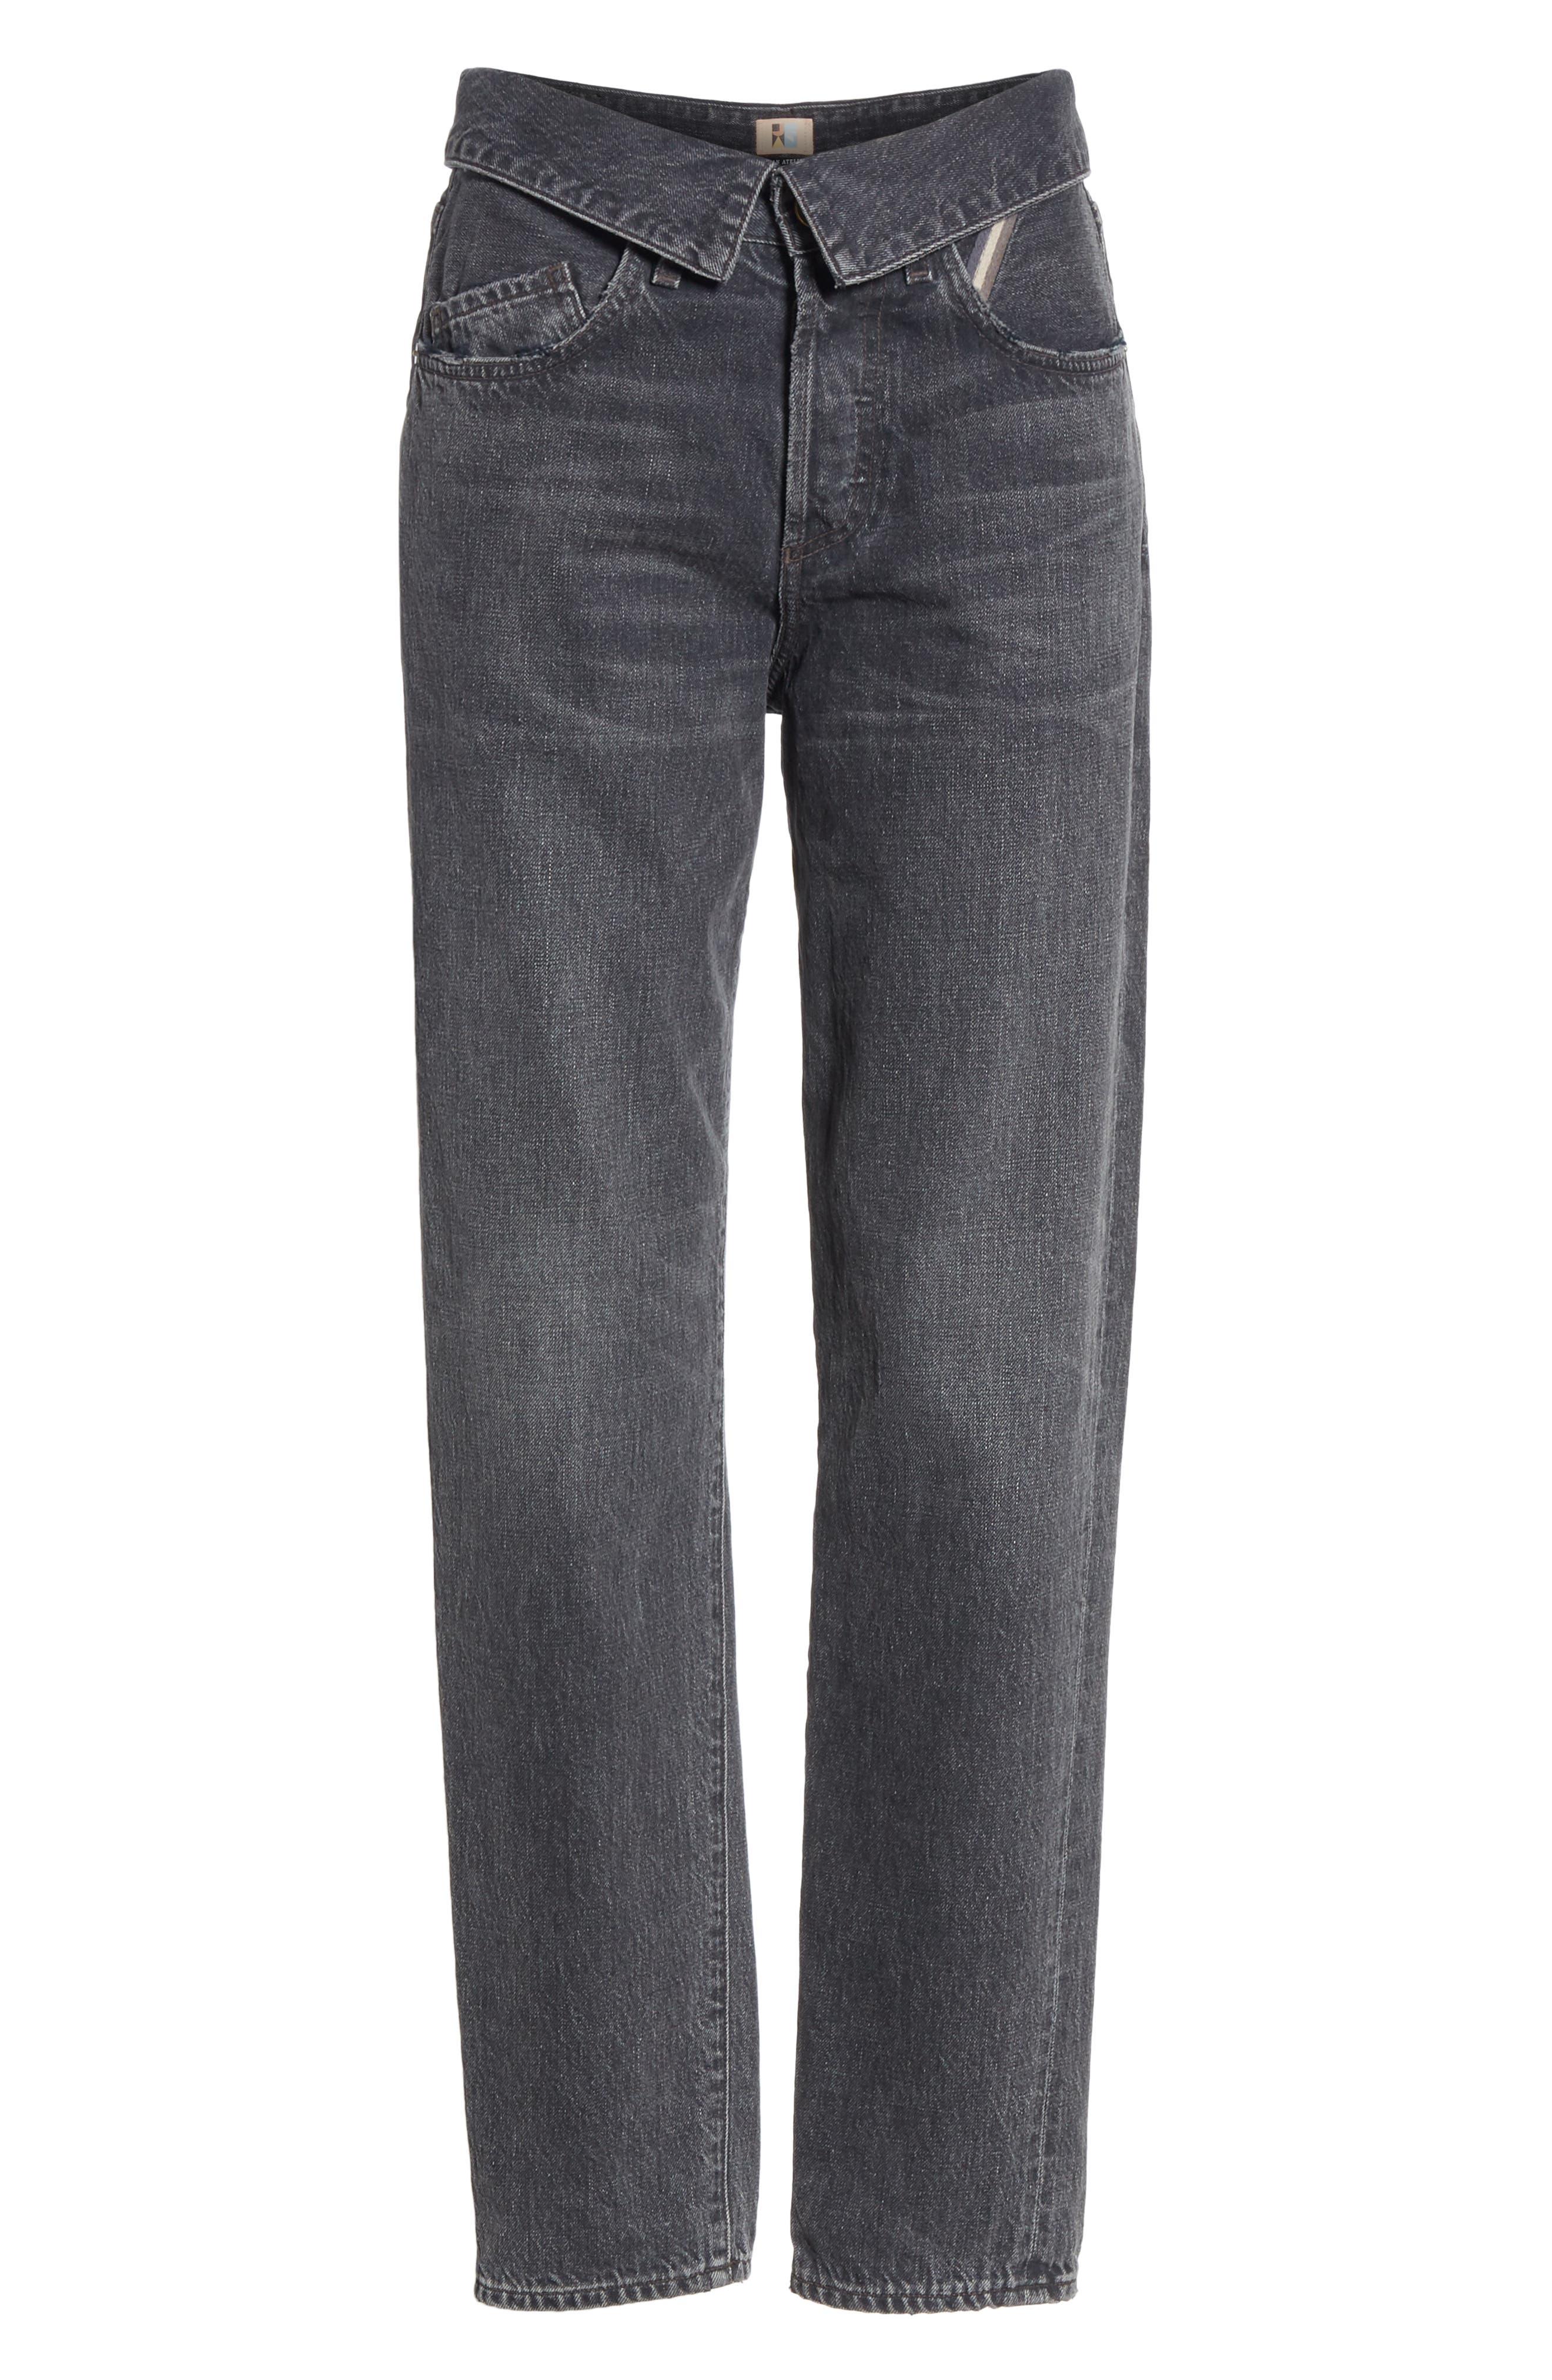 JEAN ATELIER,                             Flip Straight Leg Jeans,                             Alternate thumbnail 6, color,                             ONYX